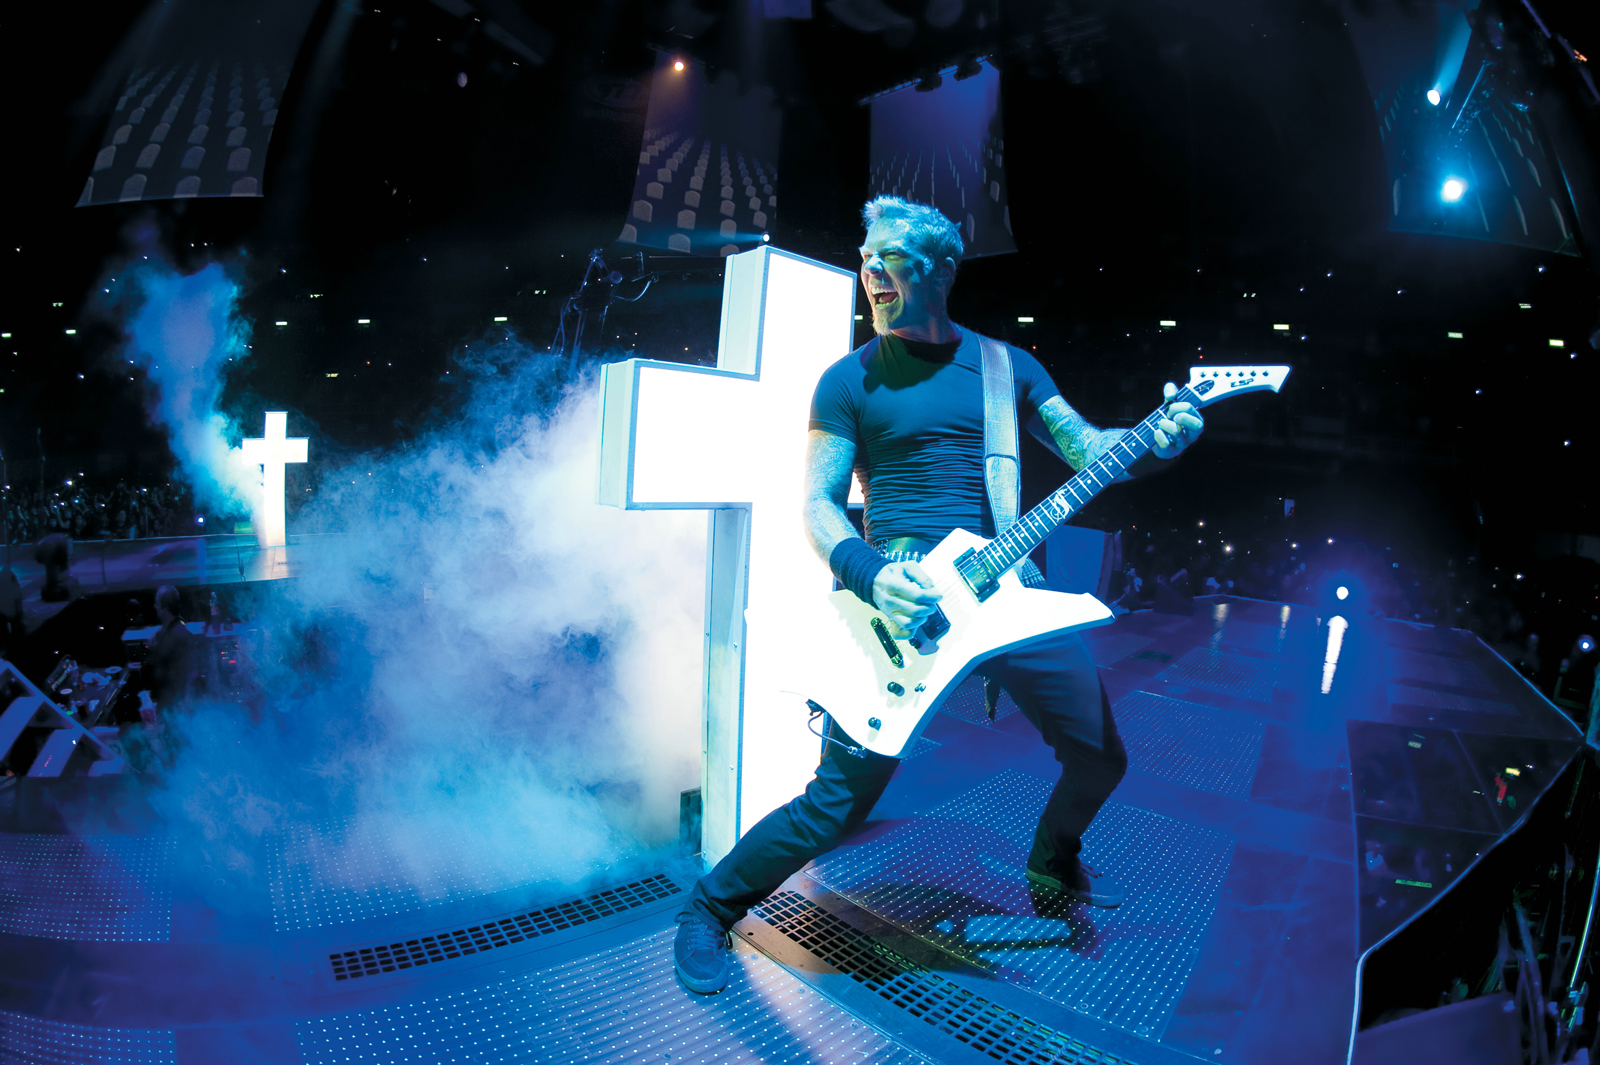 [Critique ciné] Metallica – Through the never (le film/concert en 3D)